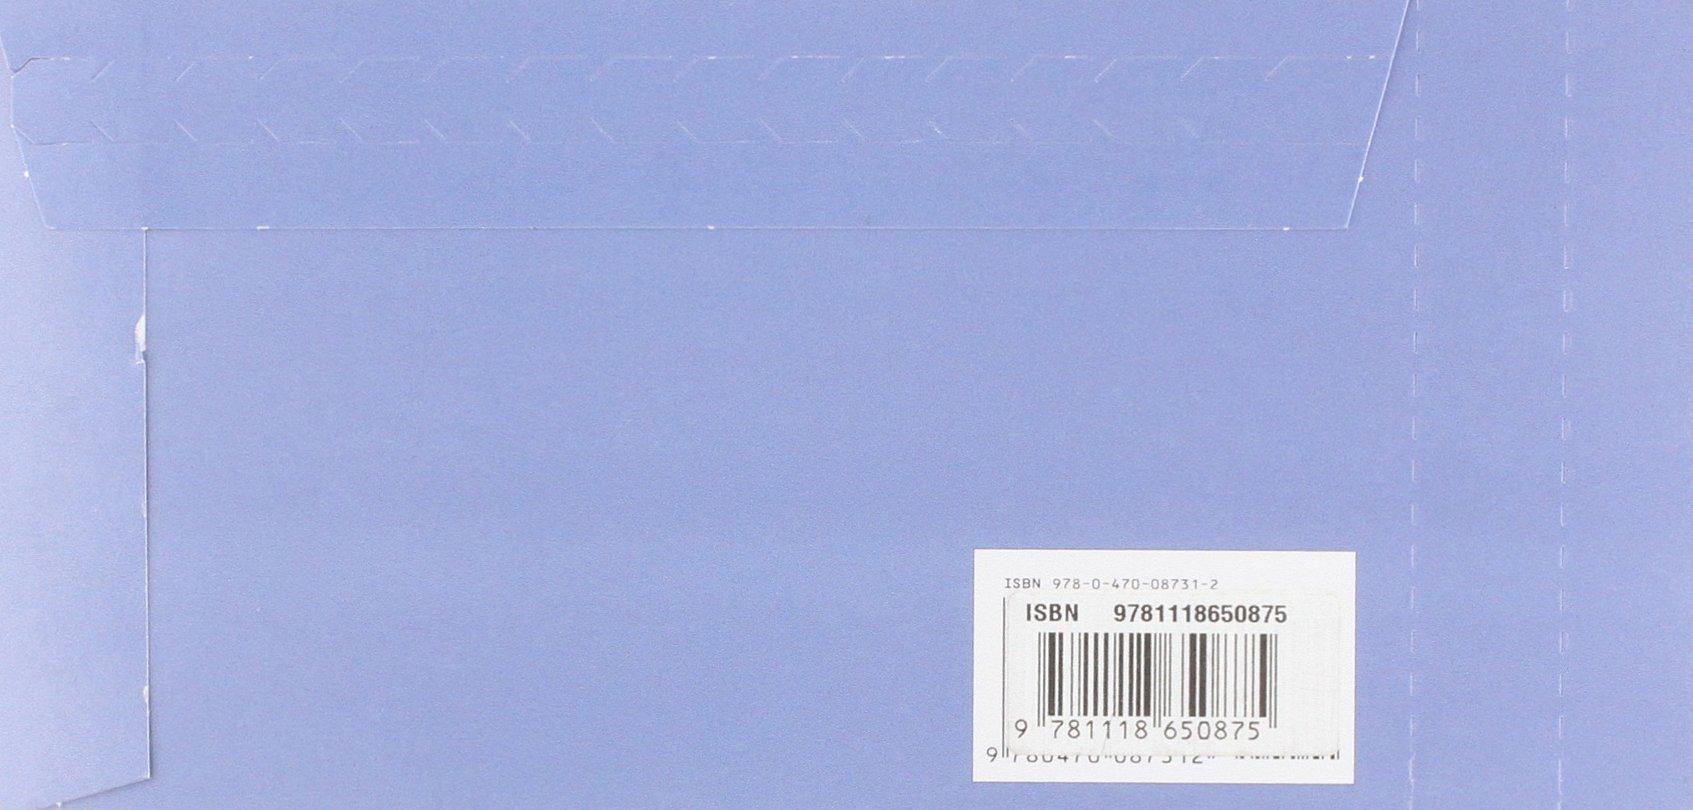 Principles of Anatomy and Physiology: 9781118650875: Amazon.com: Books